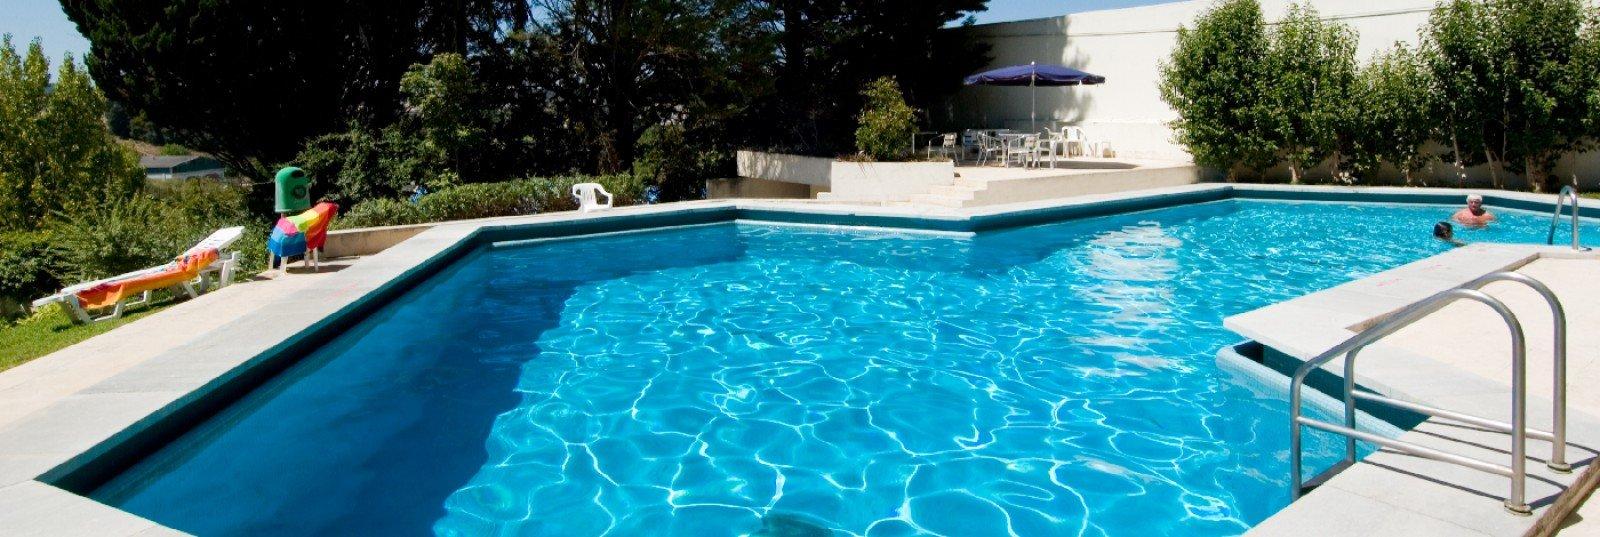 Hotel Eurosol Leiria piscina